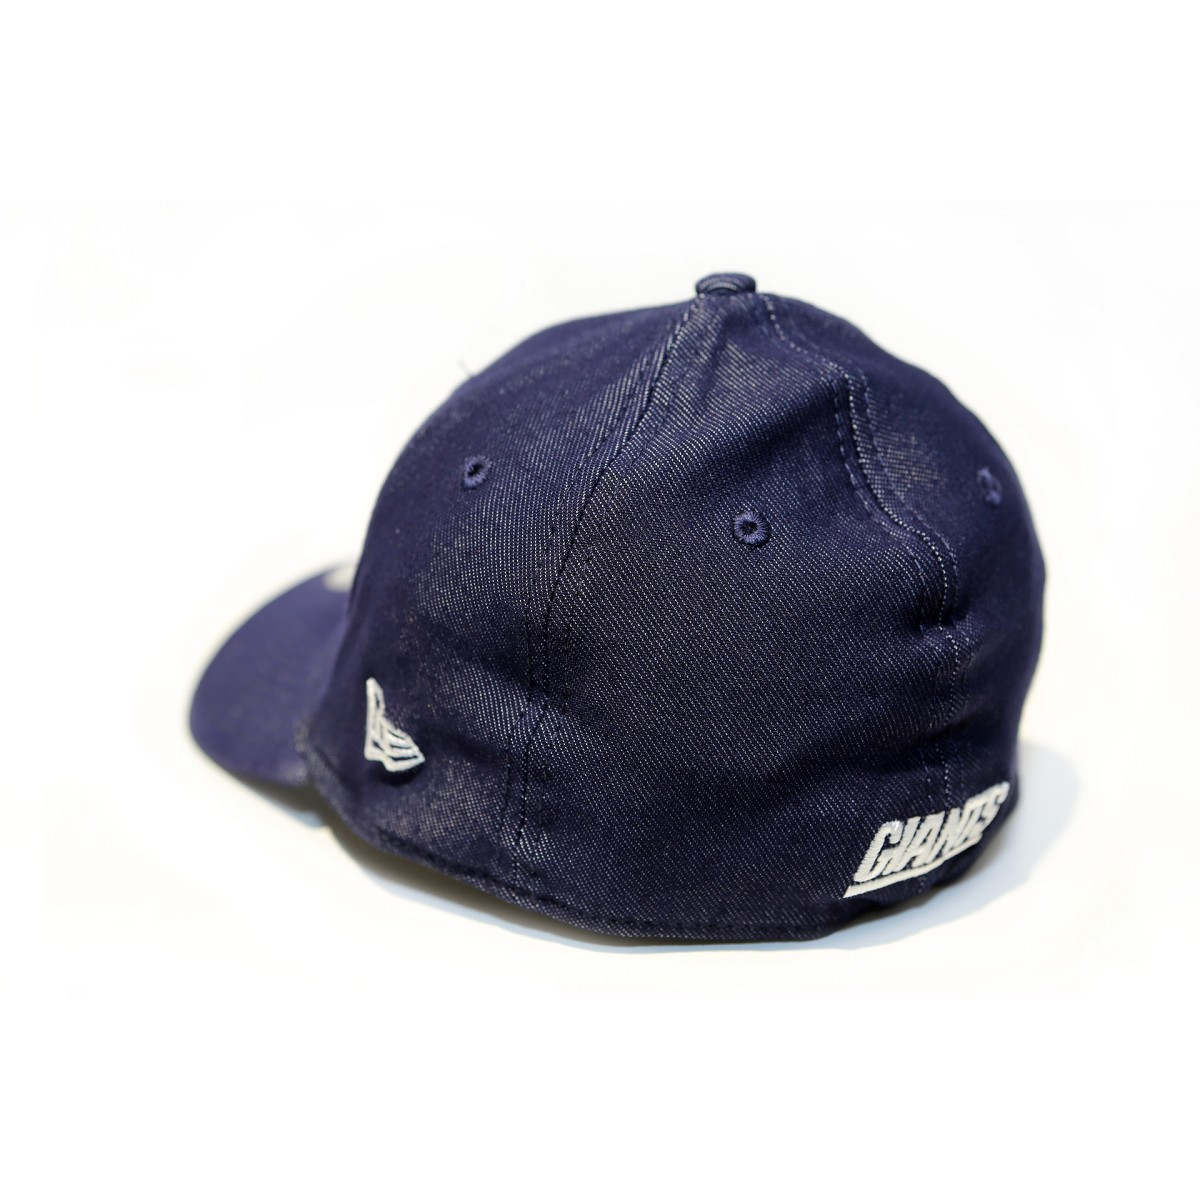 Cappello New Era 39thirty Nfl Denim New York Giants